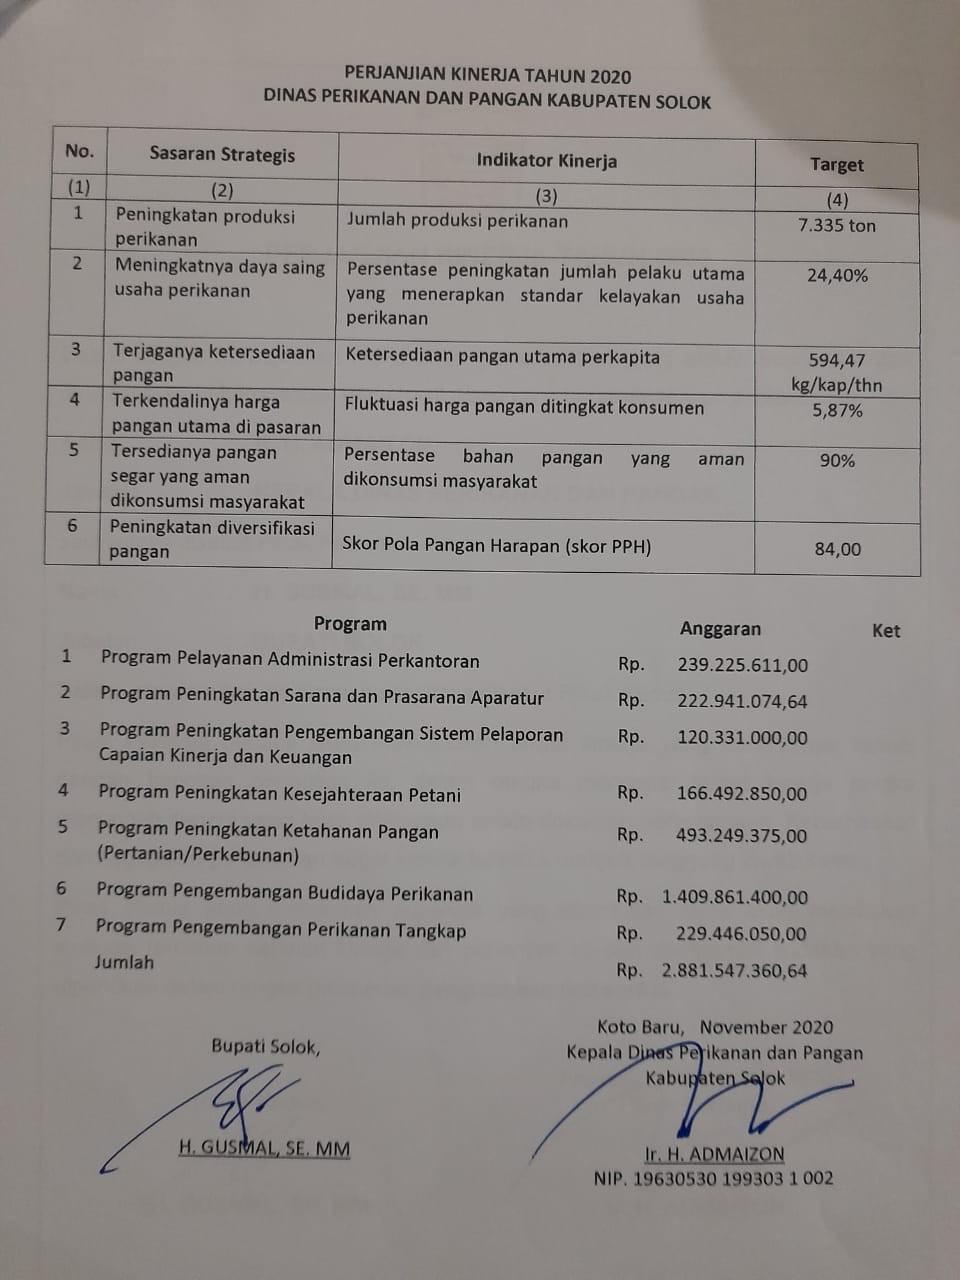 Perjanjian Kerja Tahun 2020